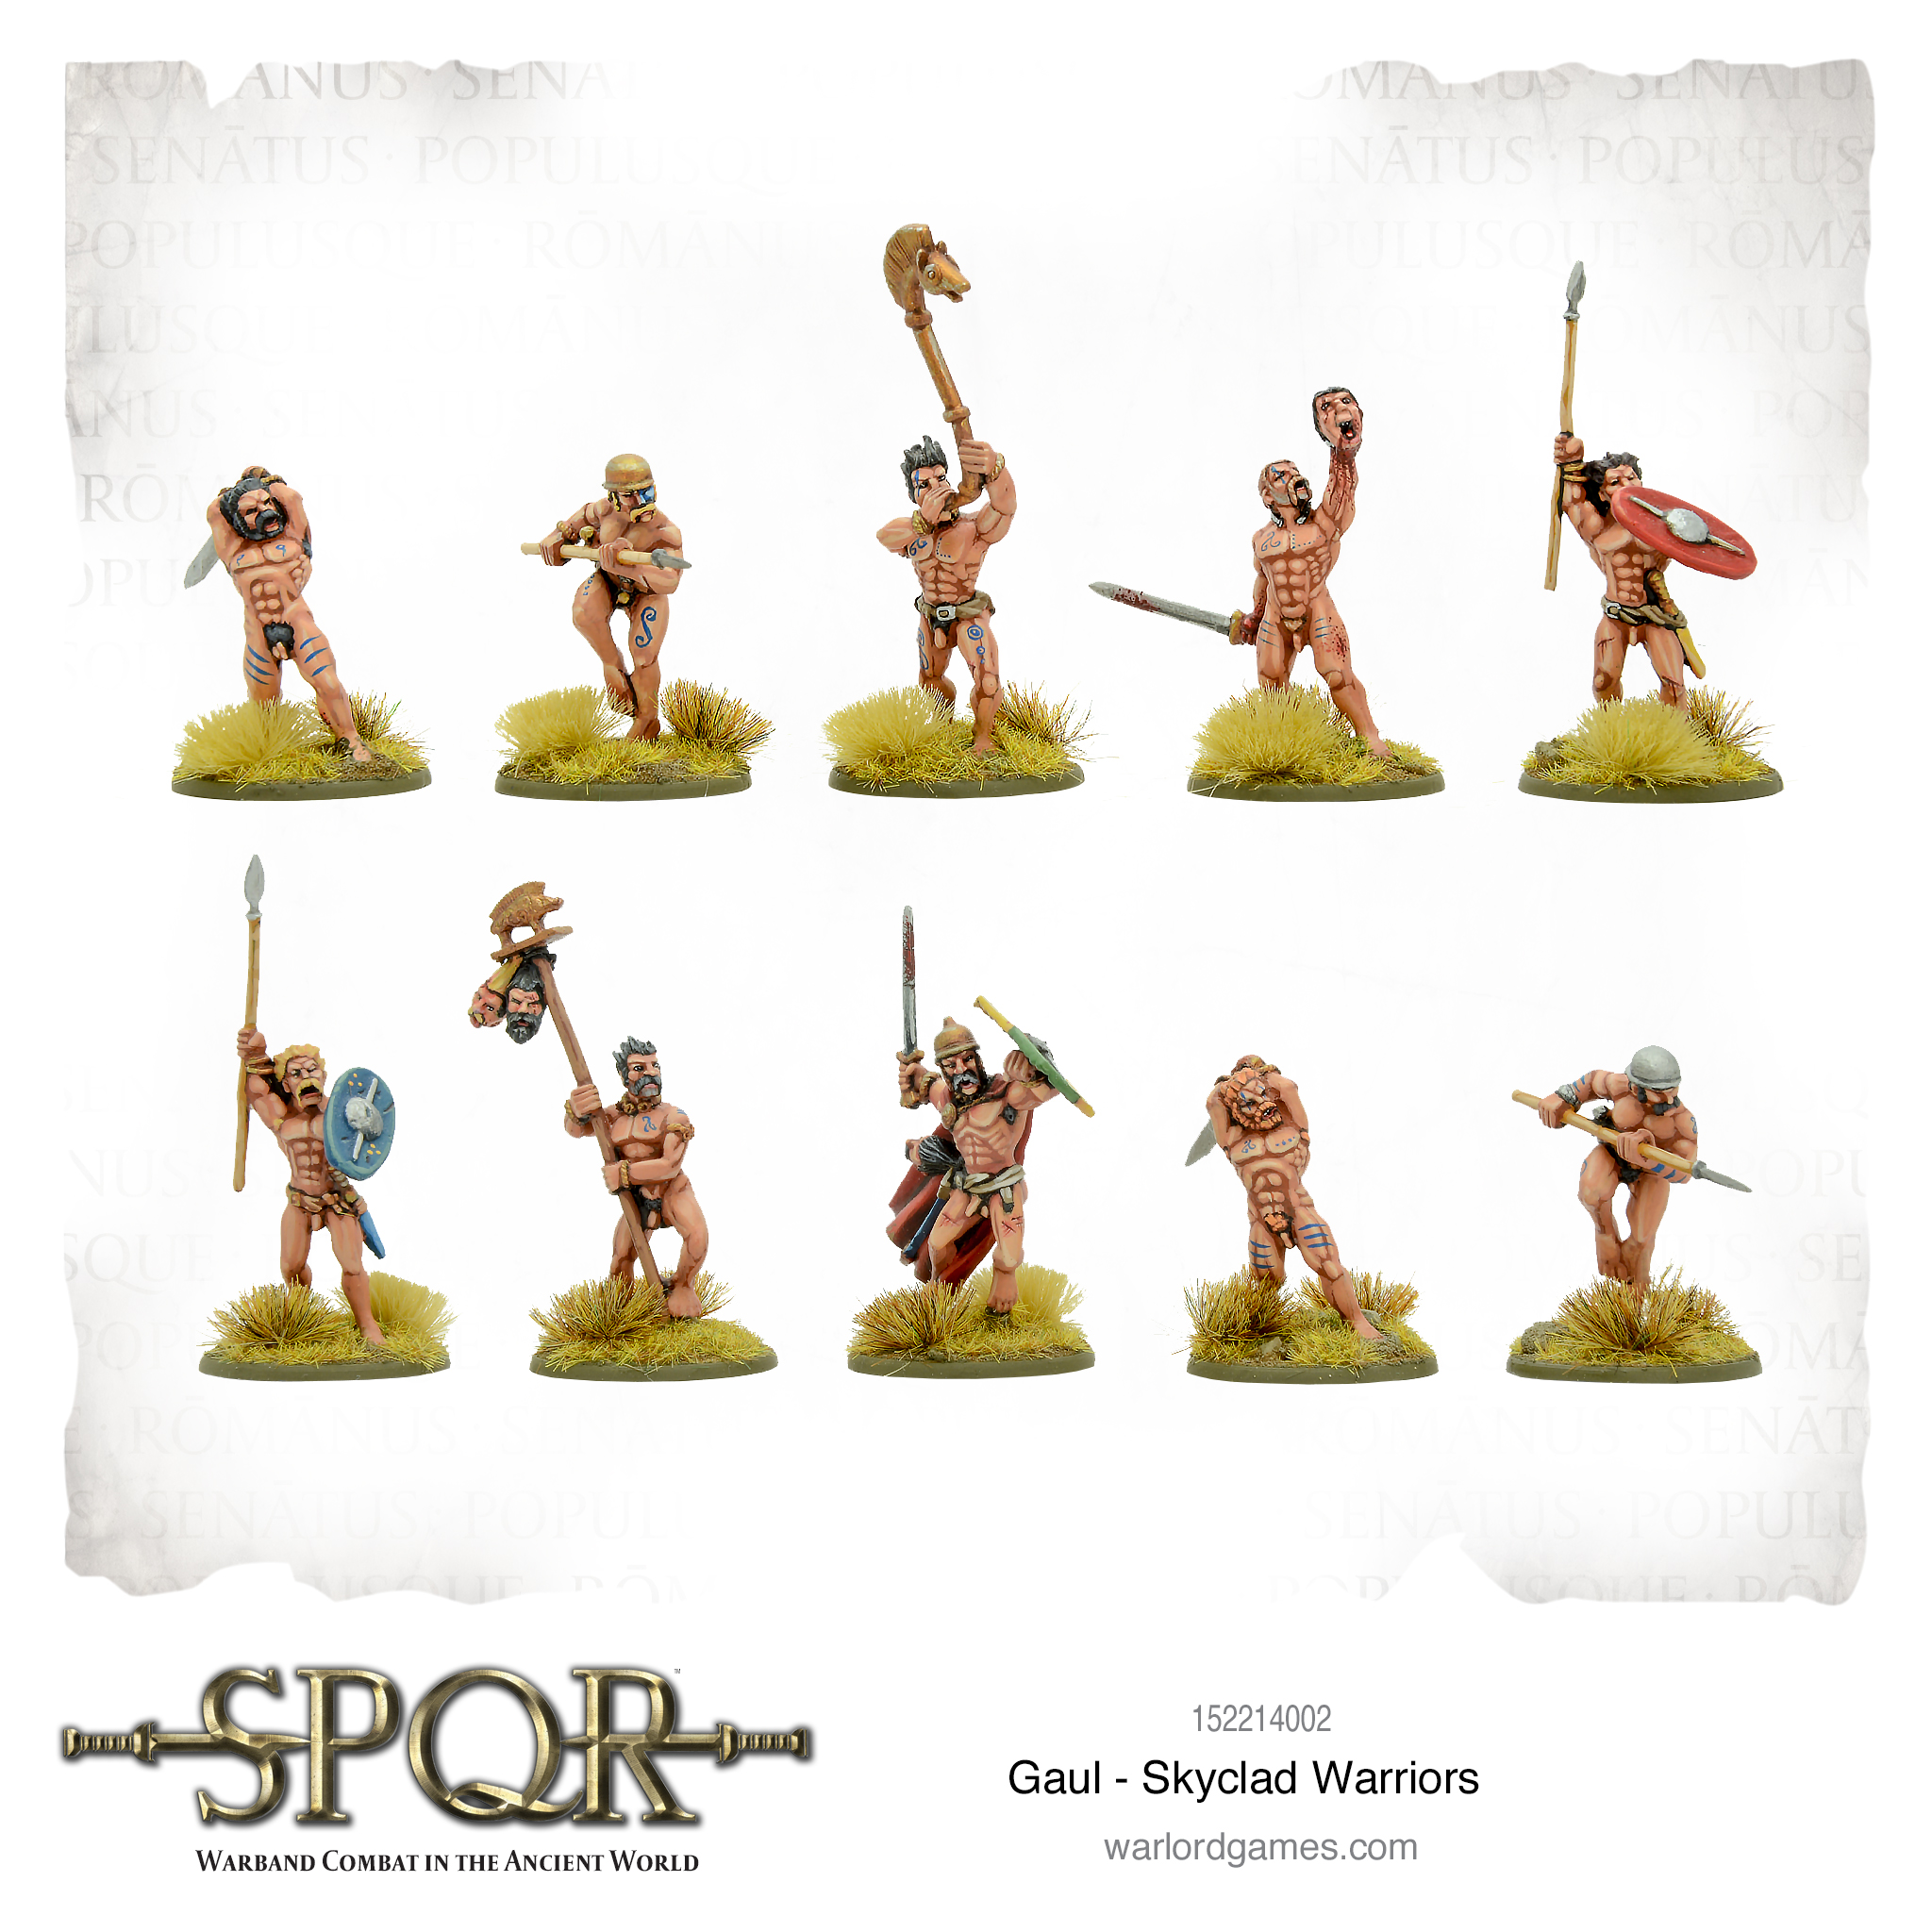 Gaul Skyclad Warriors